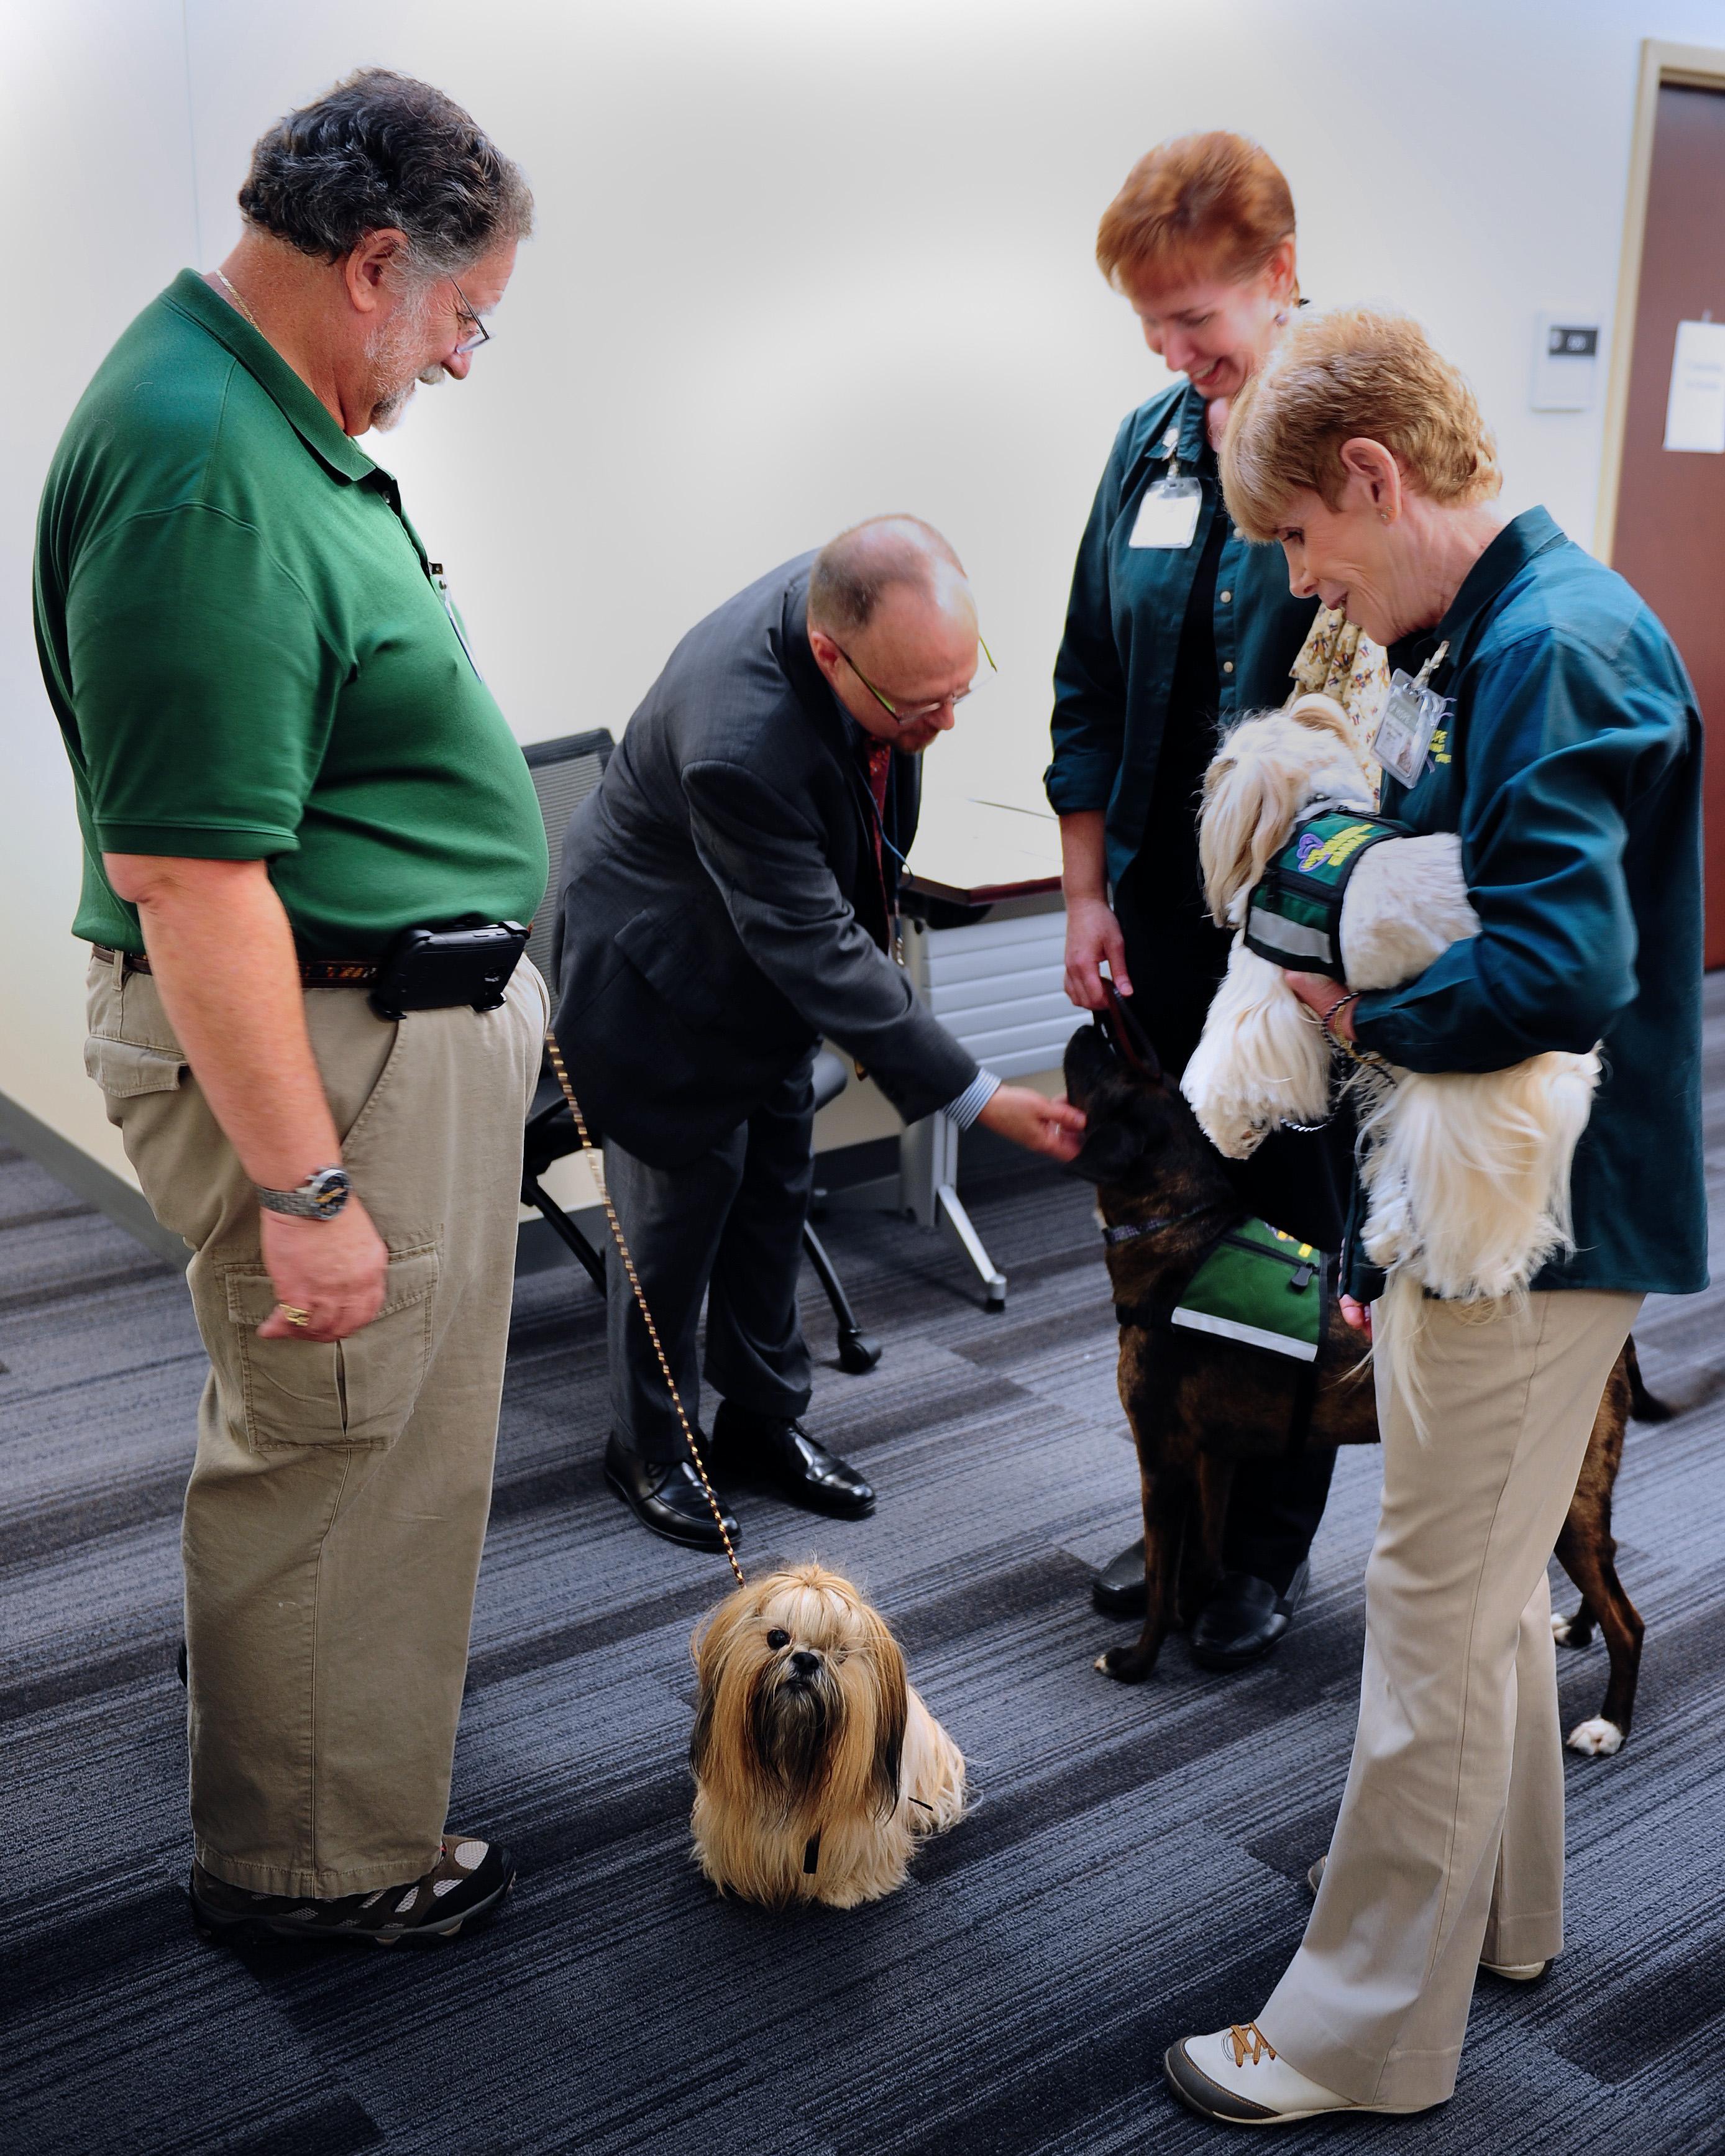 2013-09-27-comfortdogs2.JPG